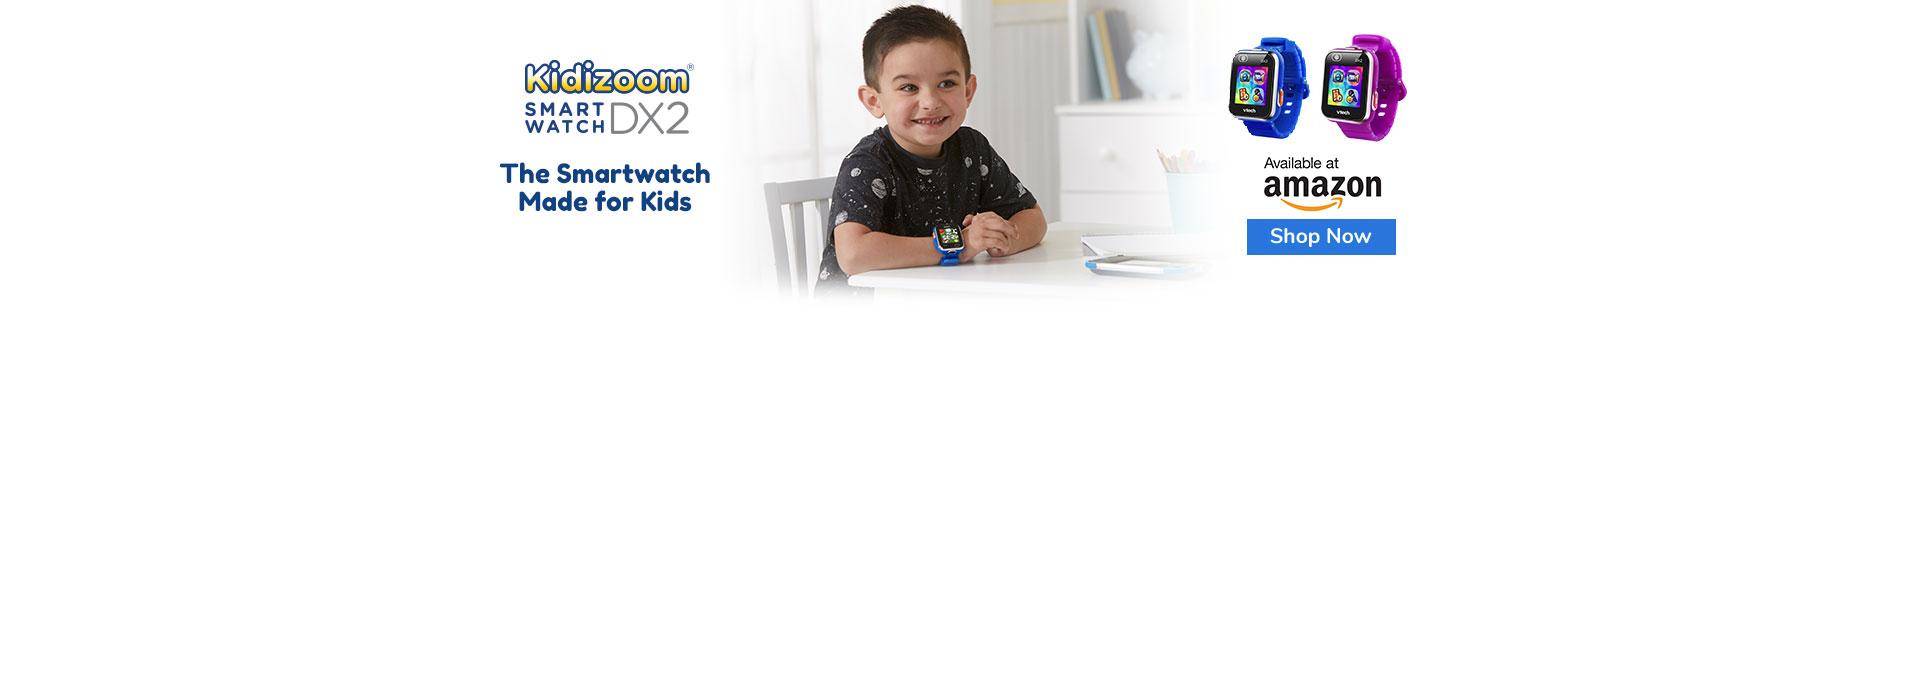 Buy Kidizoom Smartwatches at Amazon.com